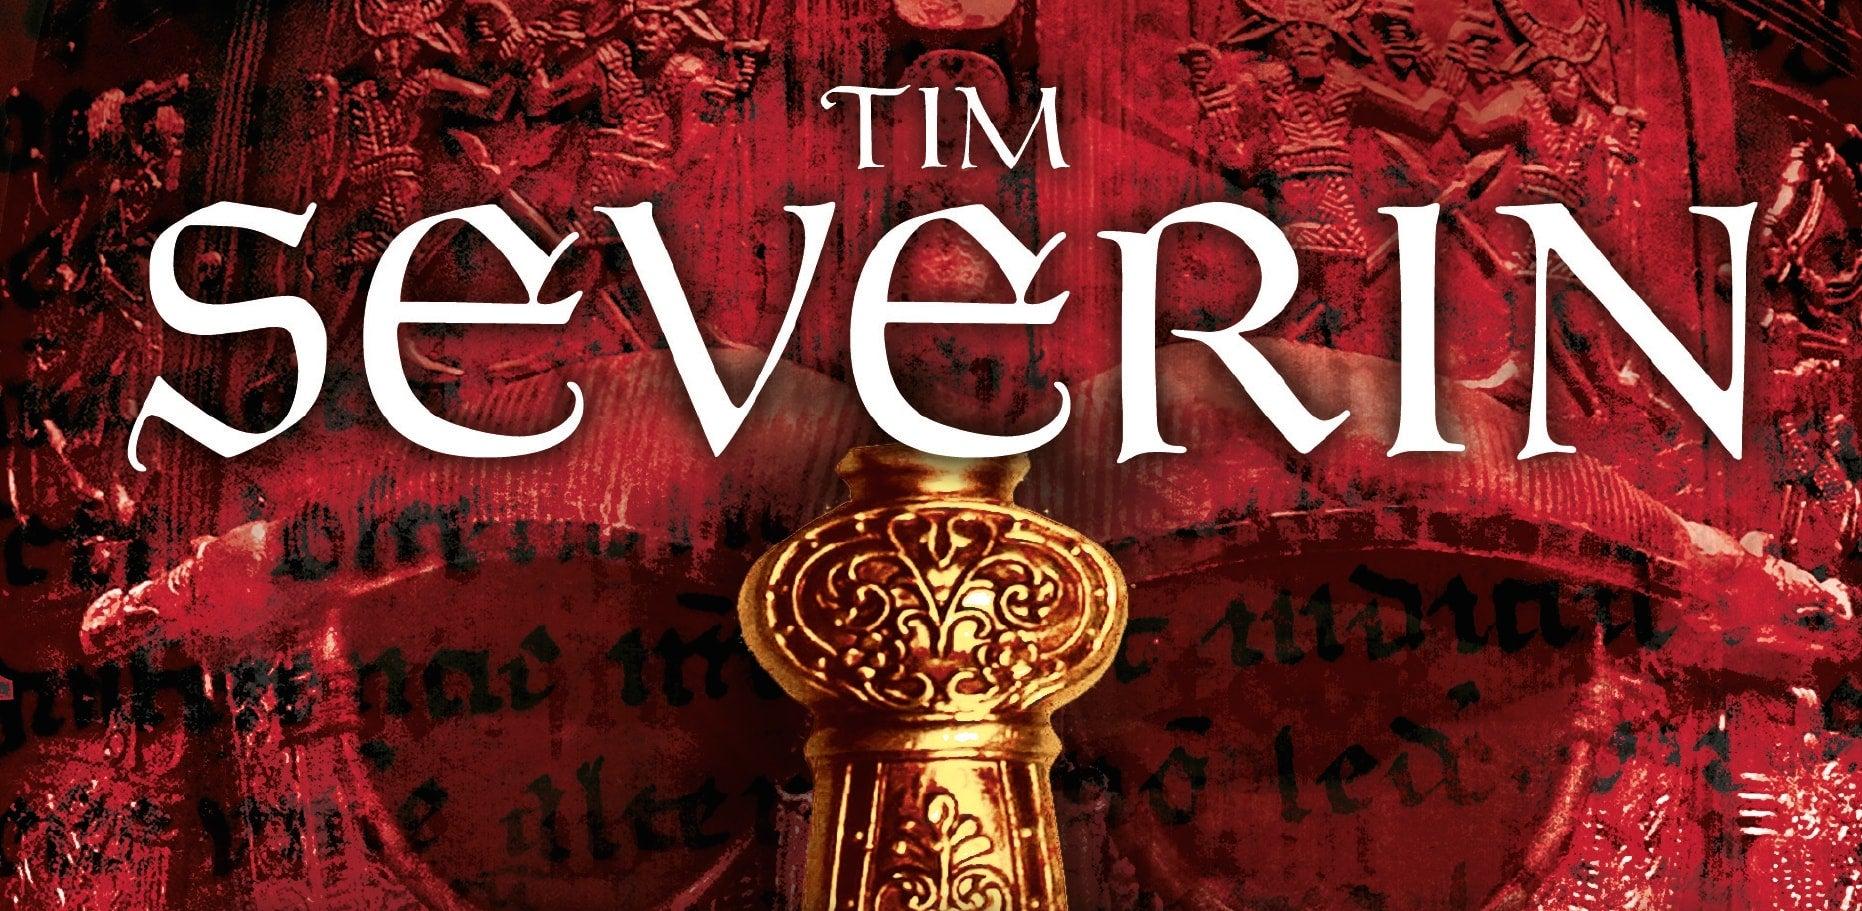 Tim Severin written in white on red background